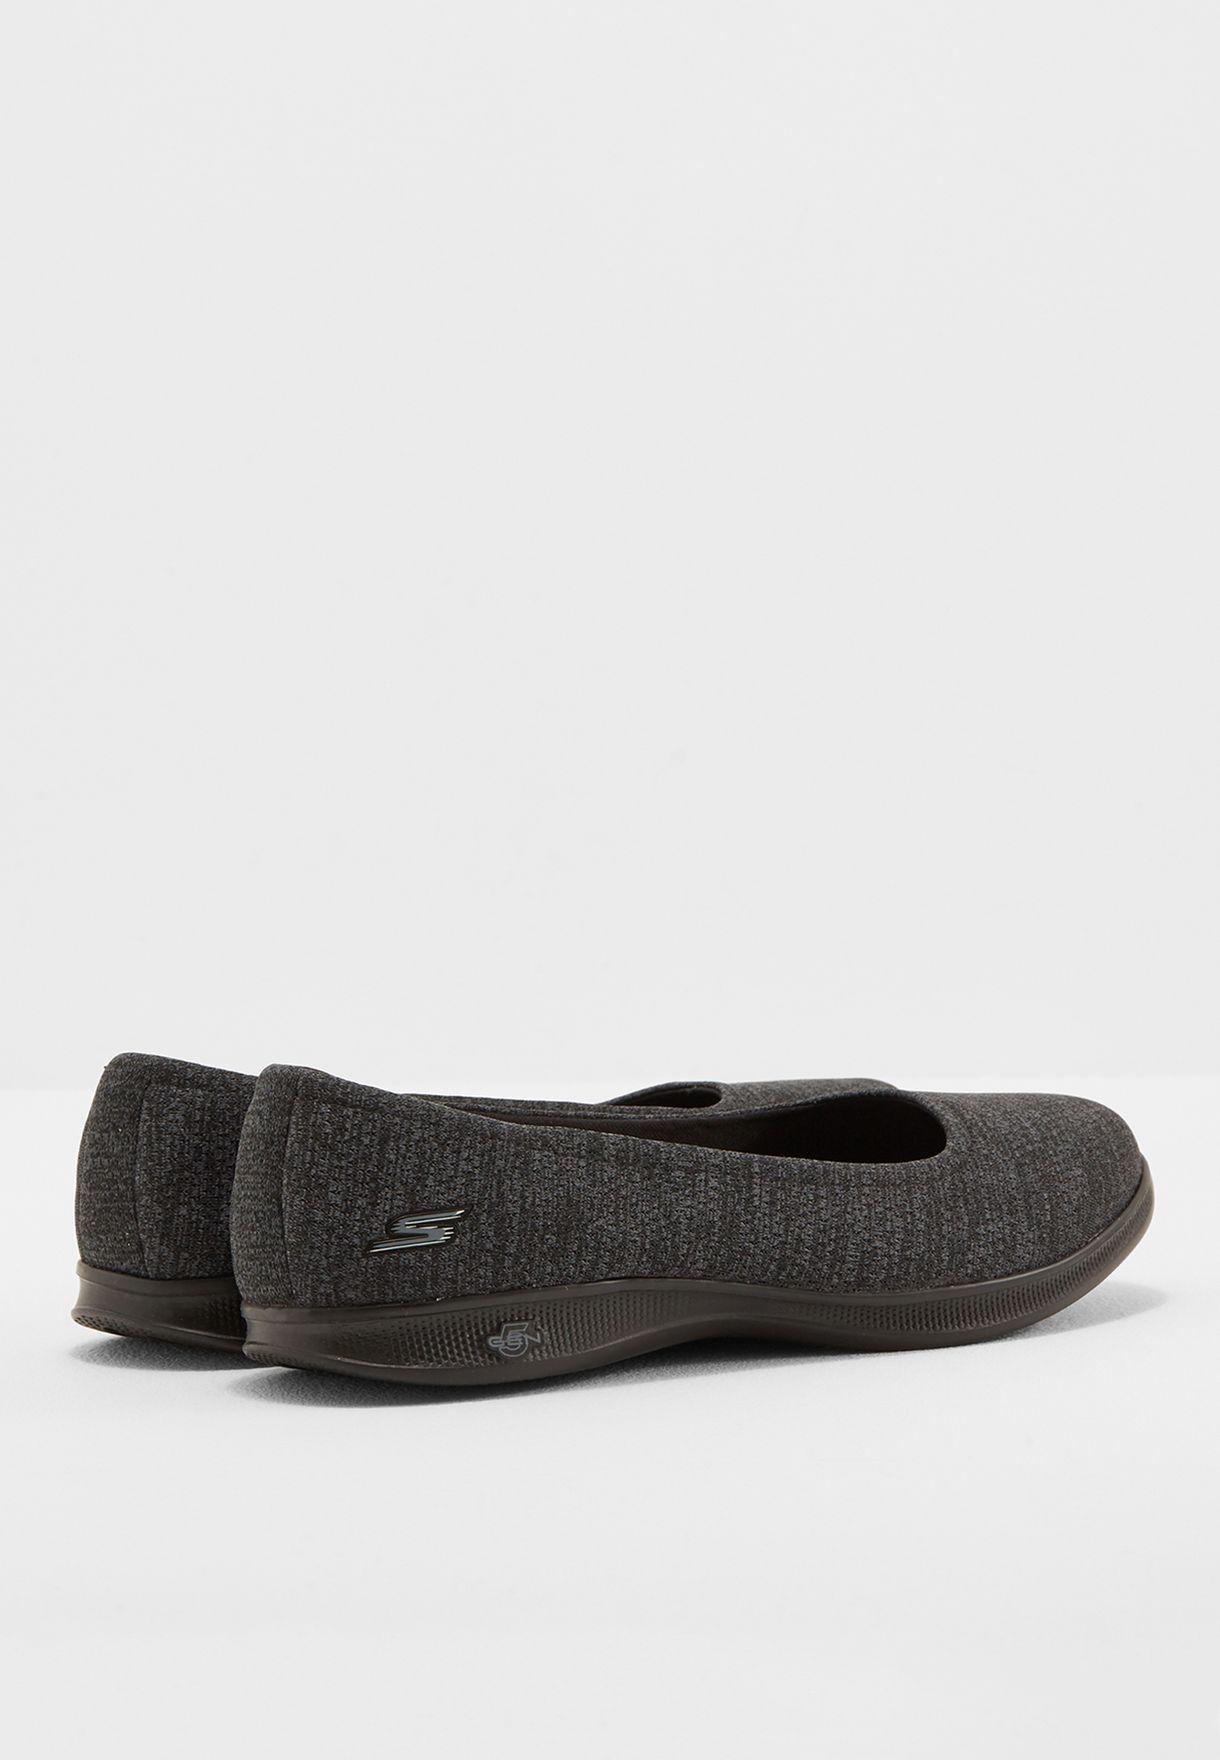 حذاء جو ستيب لايت - ايفوك